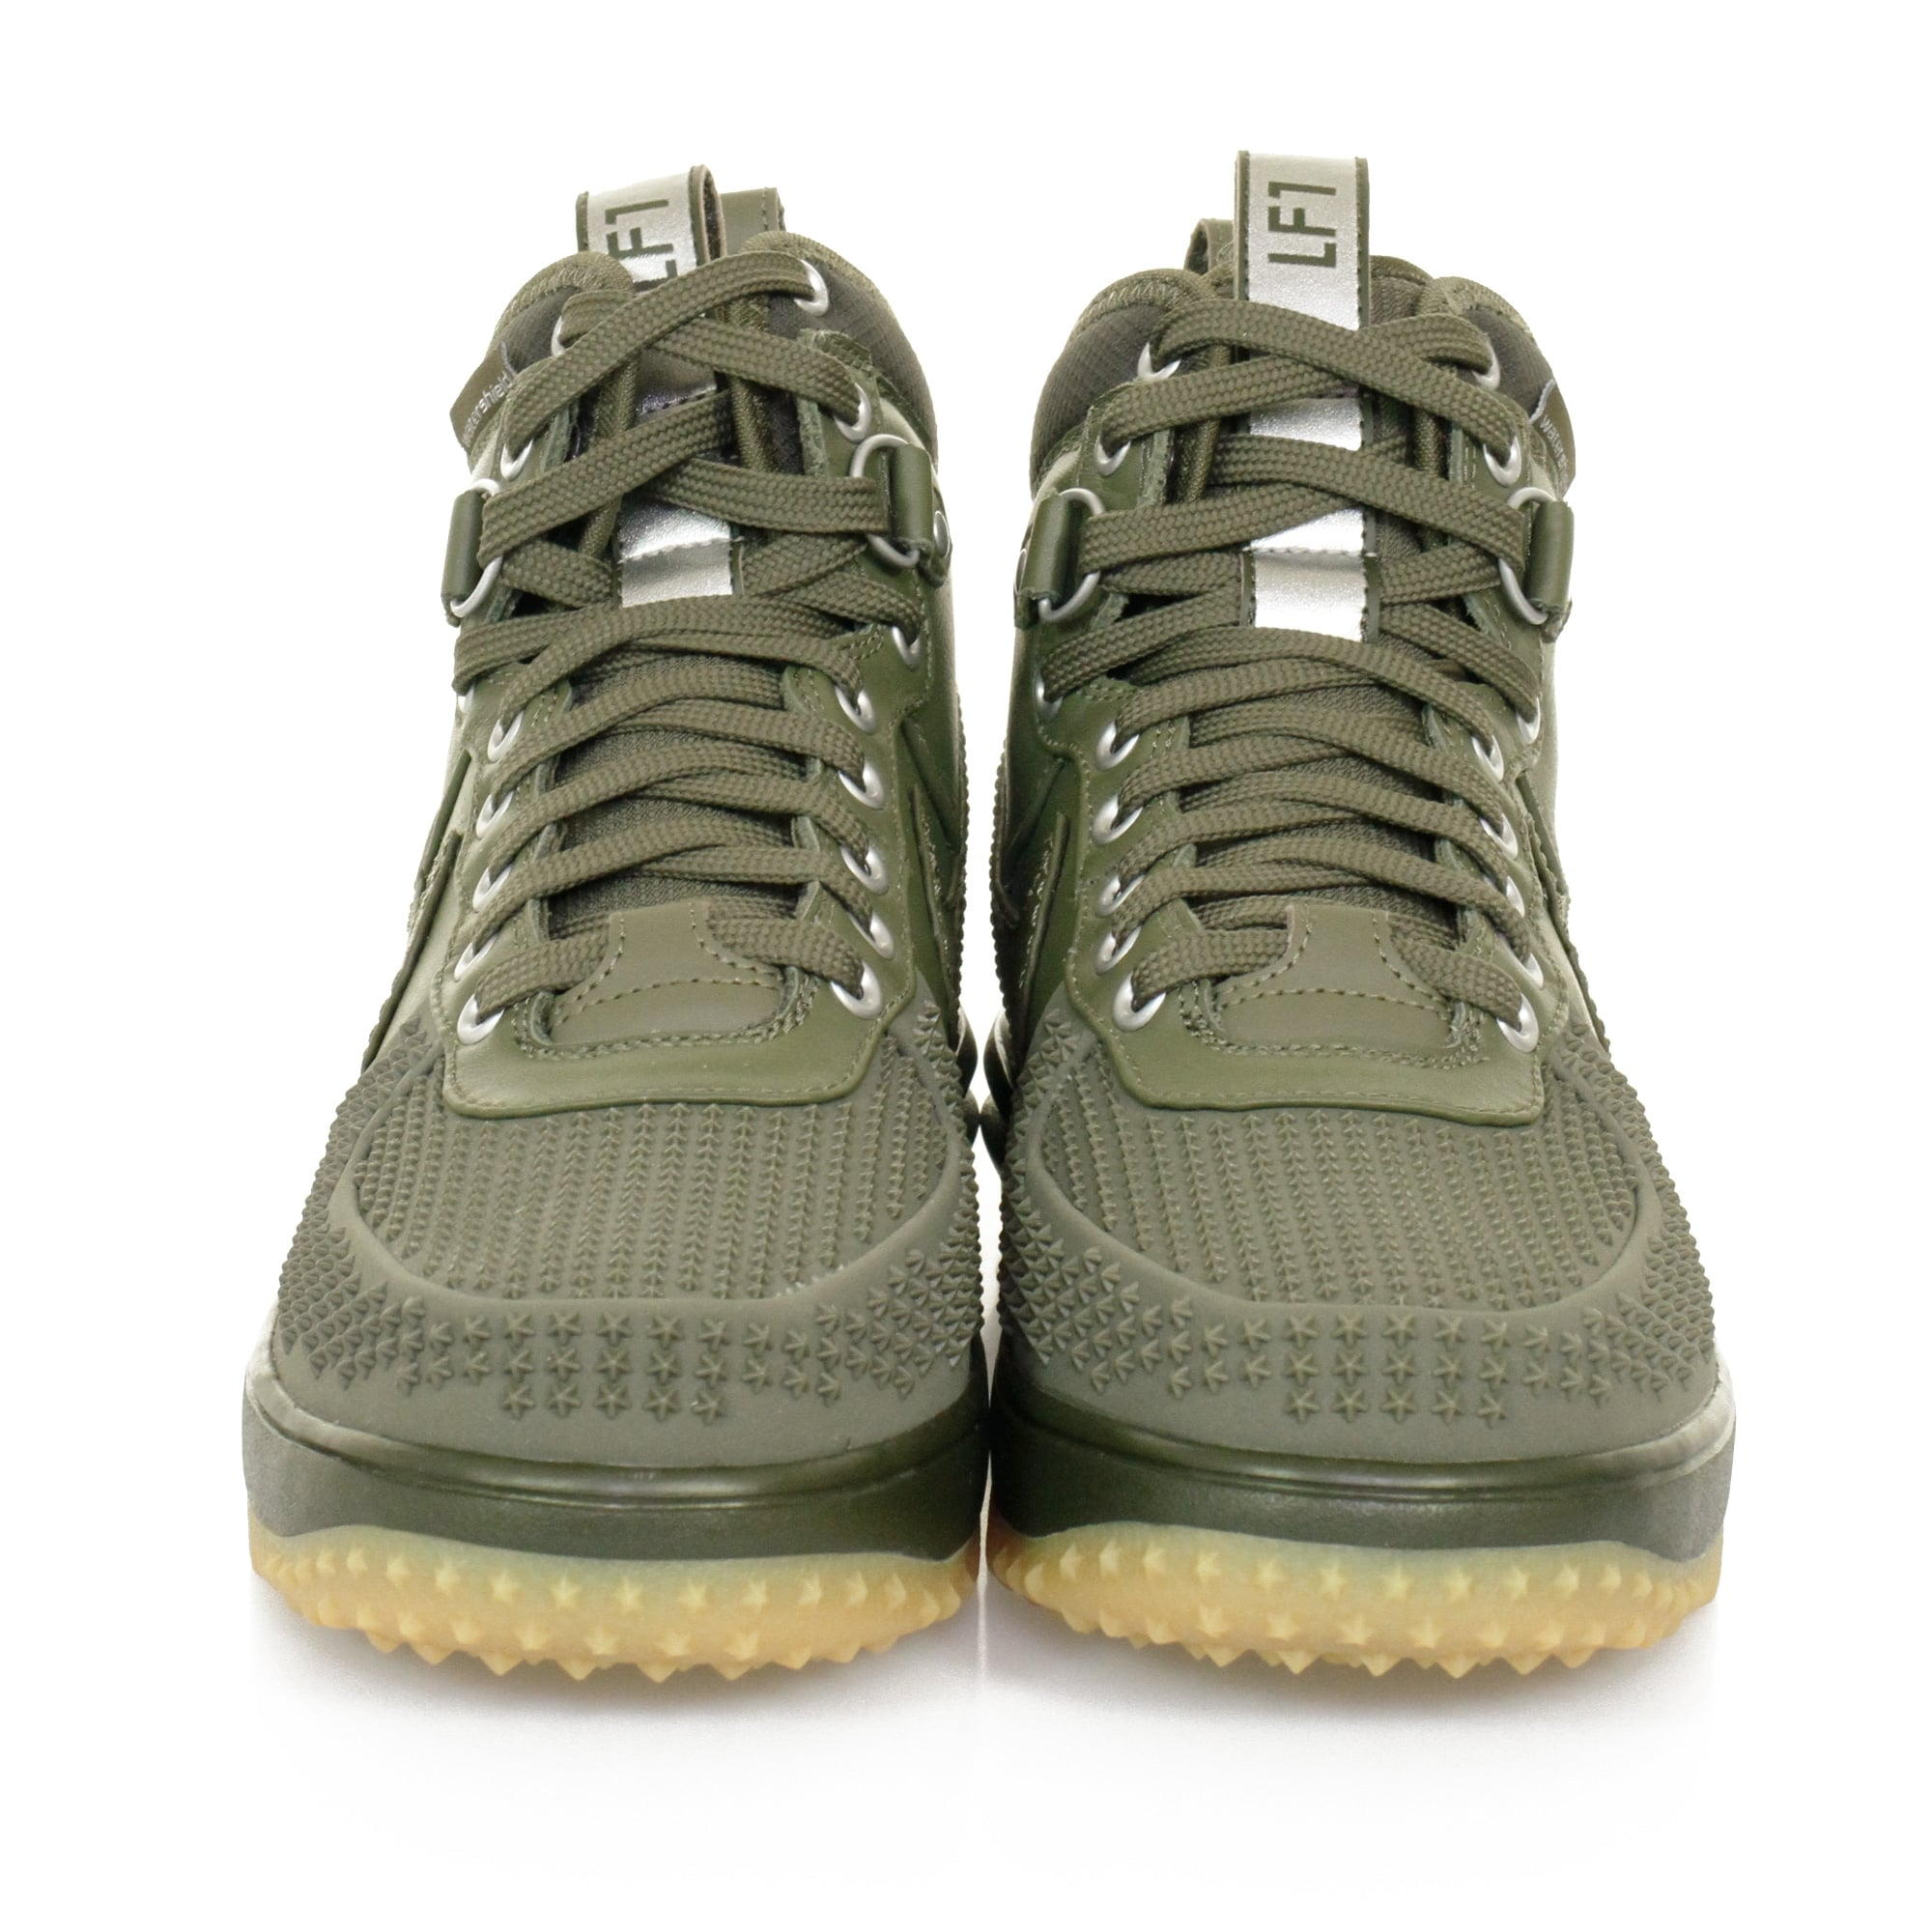 ... Nike Lunar Force 1 Duckboot Medium Olive Boot 805899201 ...